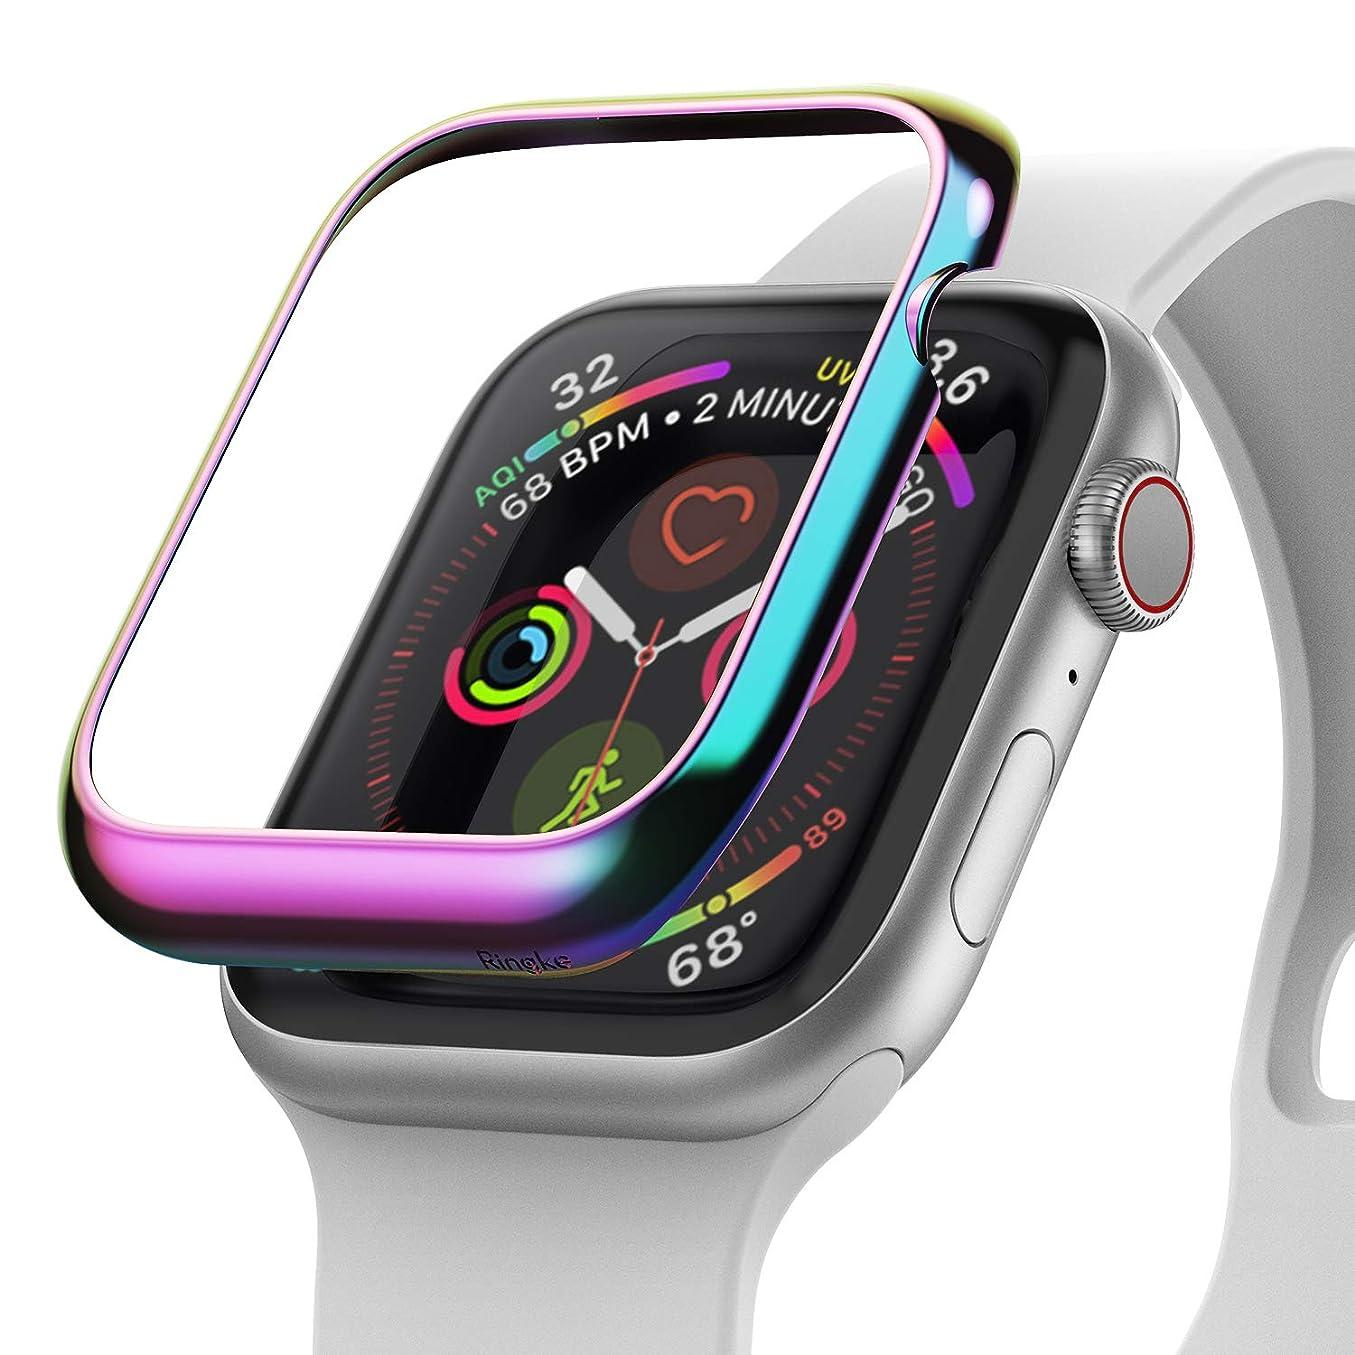 【Ringke】Apple Watch 44mm ケース コスパ最高 衝撃吸収 アップルウォッチ シリーズ 4 Apple Watch series 4 ケース (2018) [Apple Bezel Styling] AW4-08 (Multi-Colored)